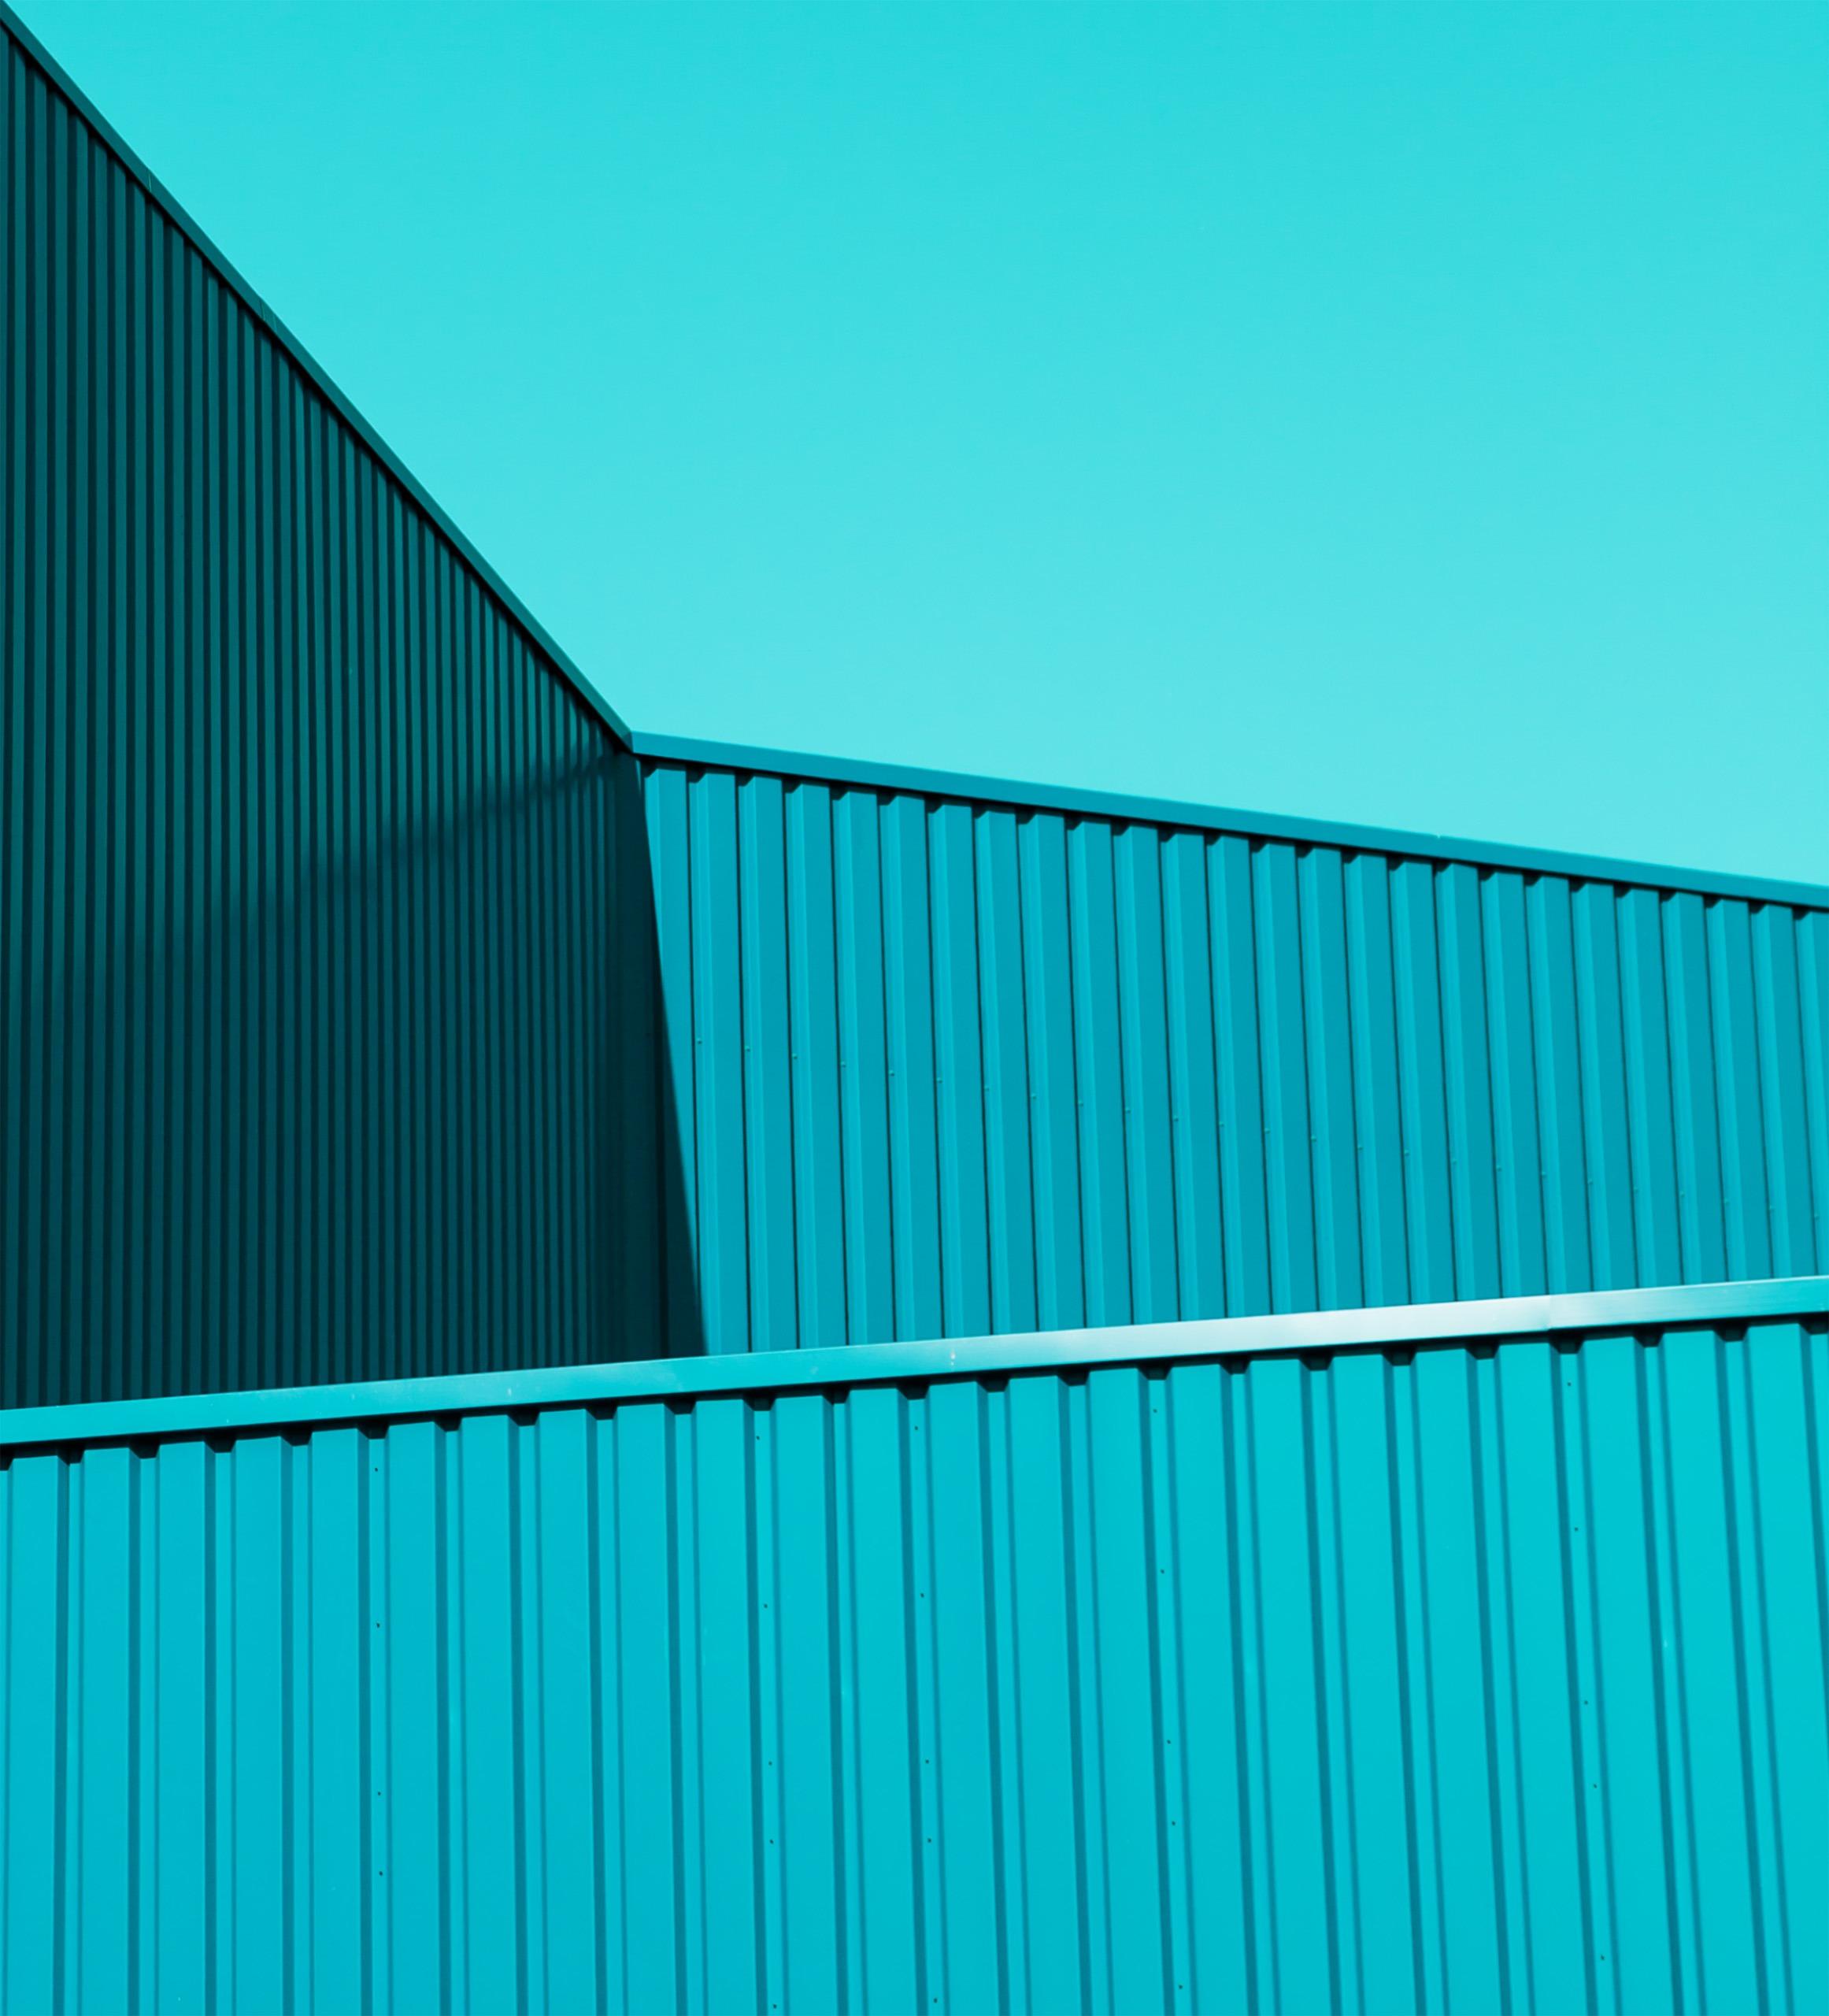 Android 5.0 Lollipop Wallpaper figuras contenedores azul aqua